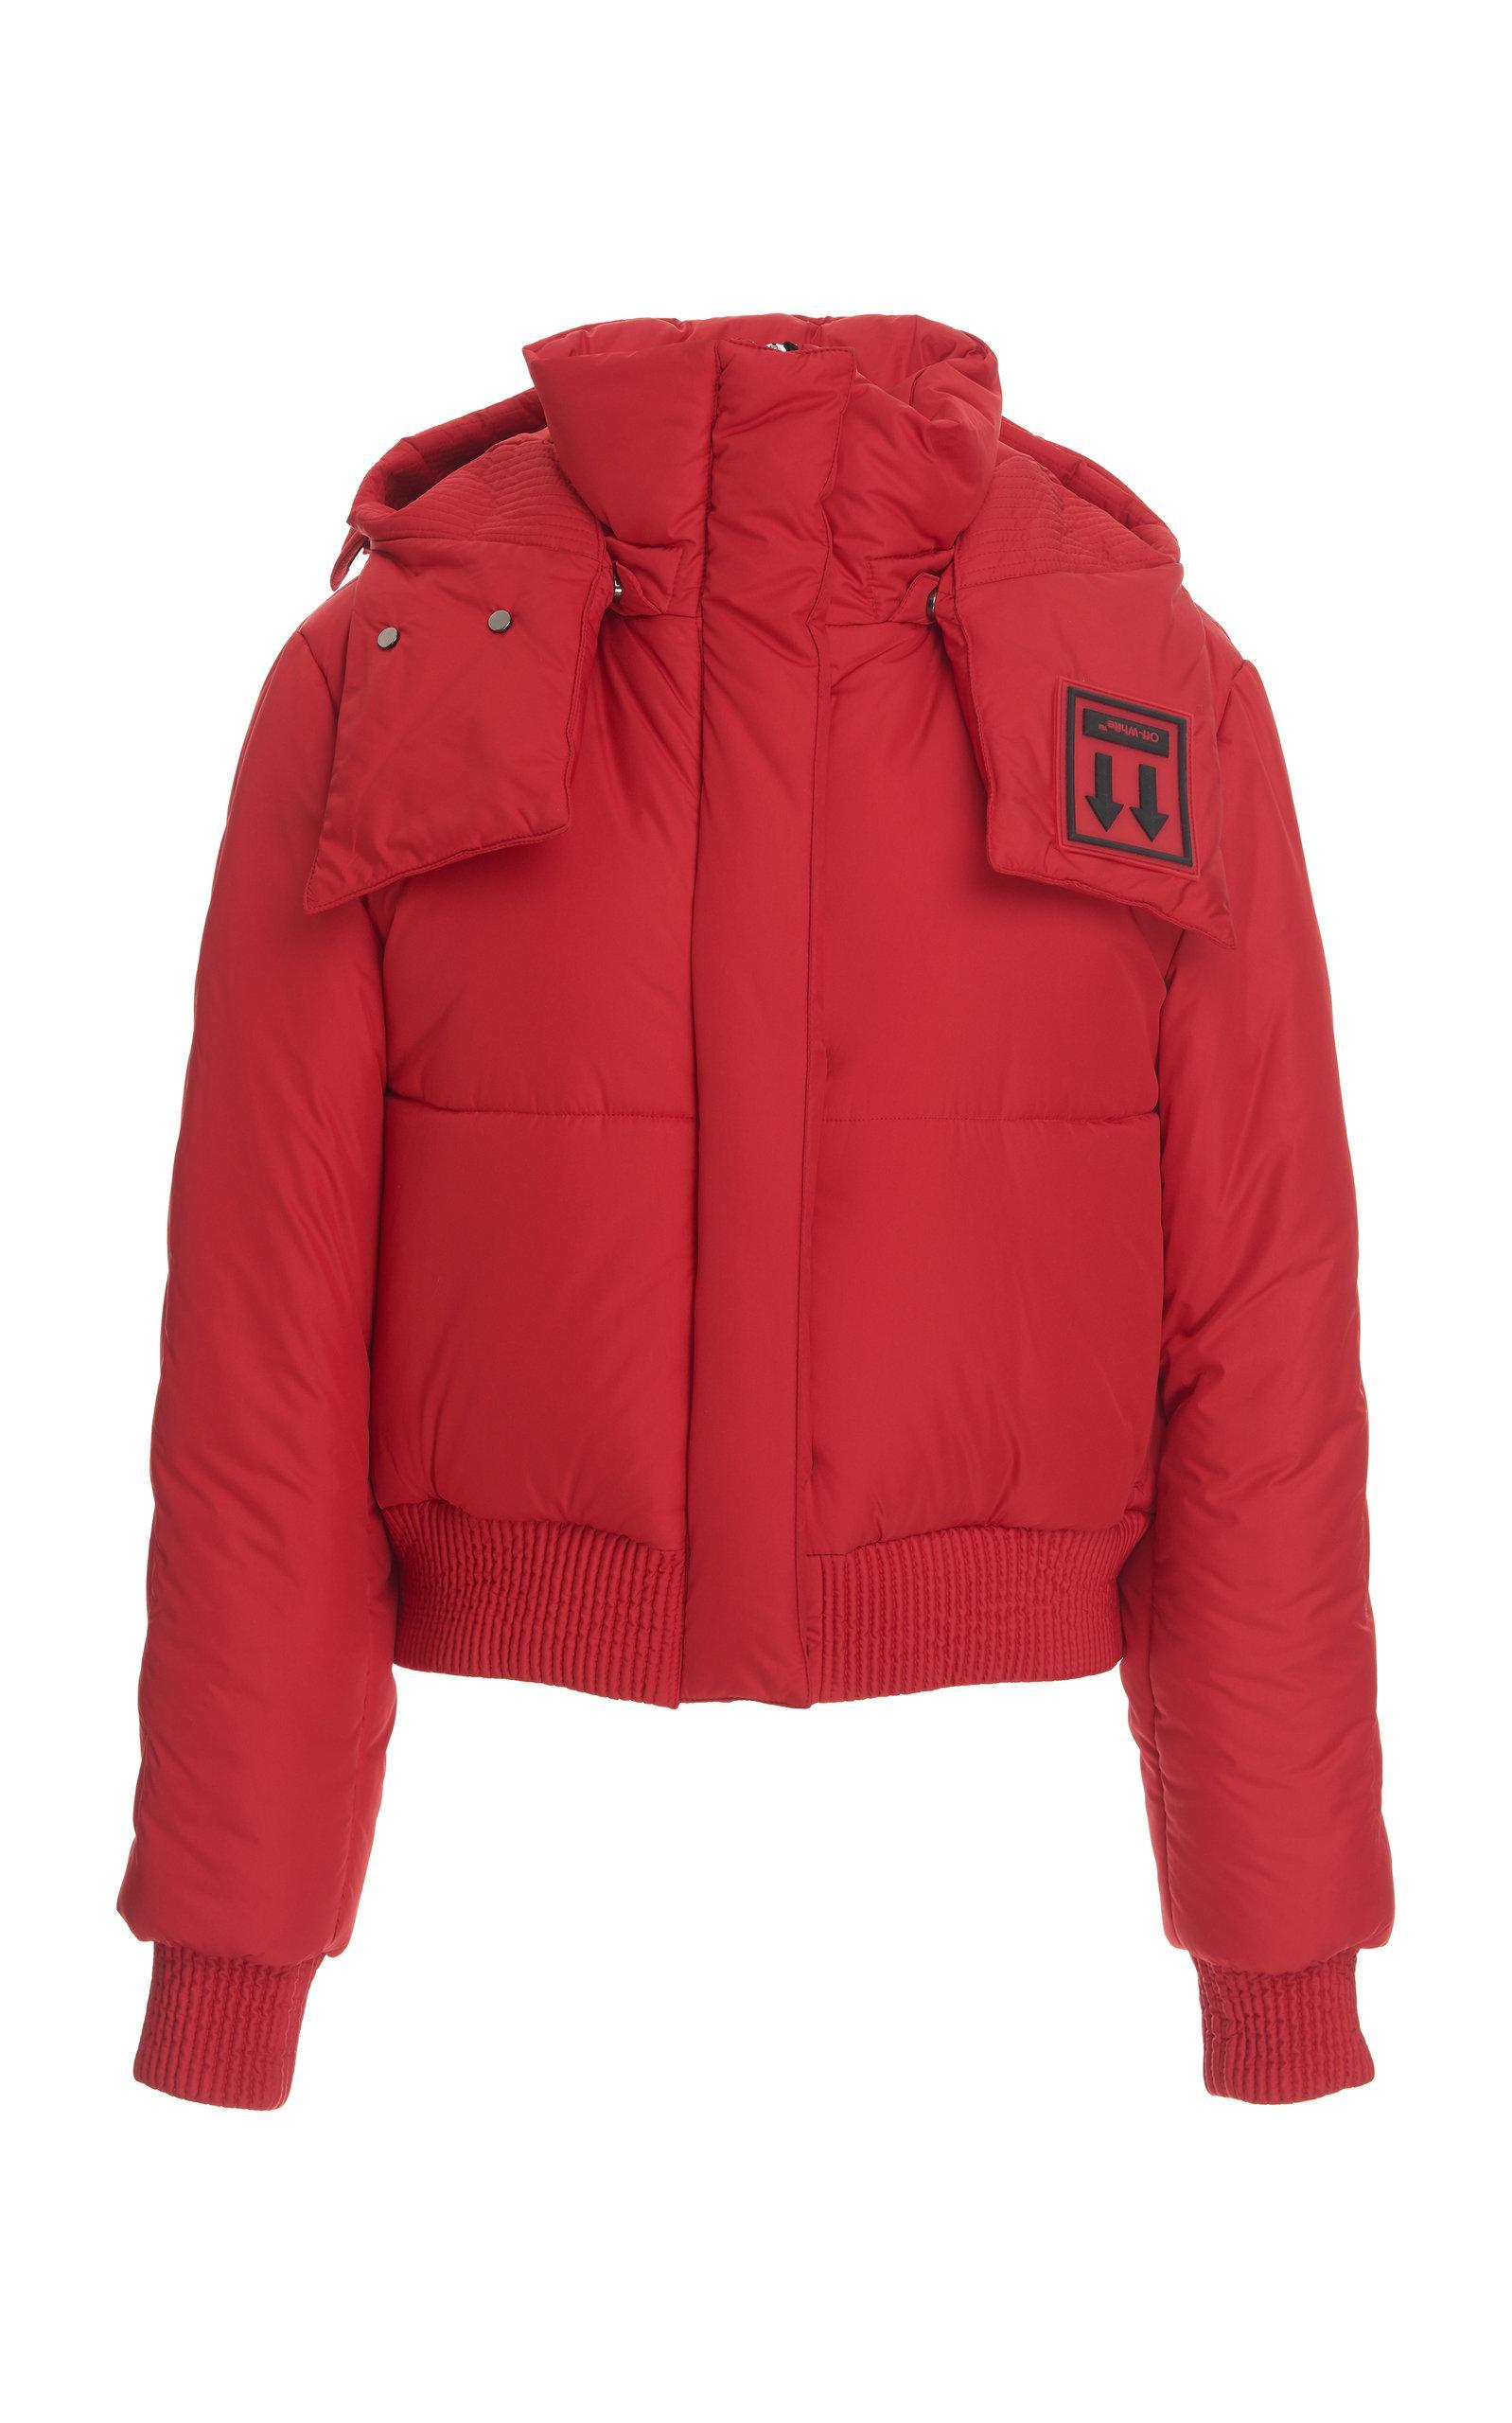 c16b1fe67316 Lyst - Off-White C O Virgil Abloh Short Down Jacket in Red